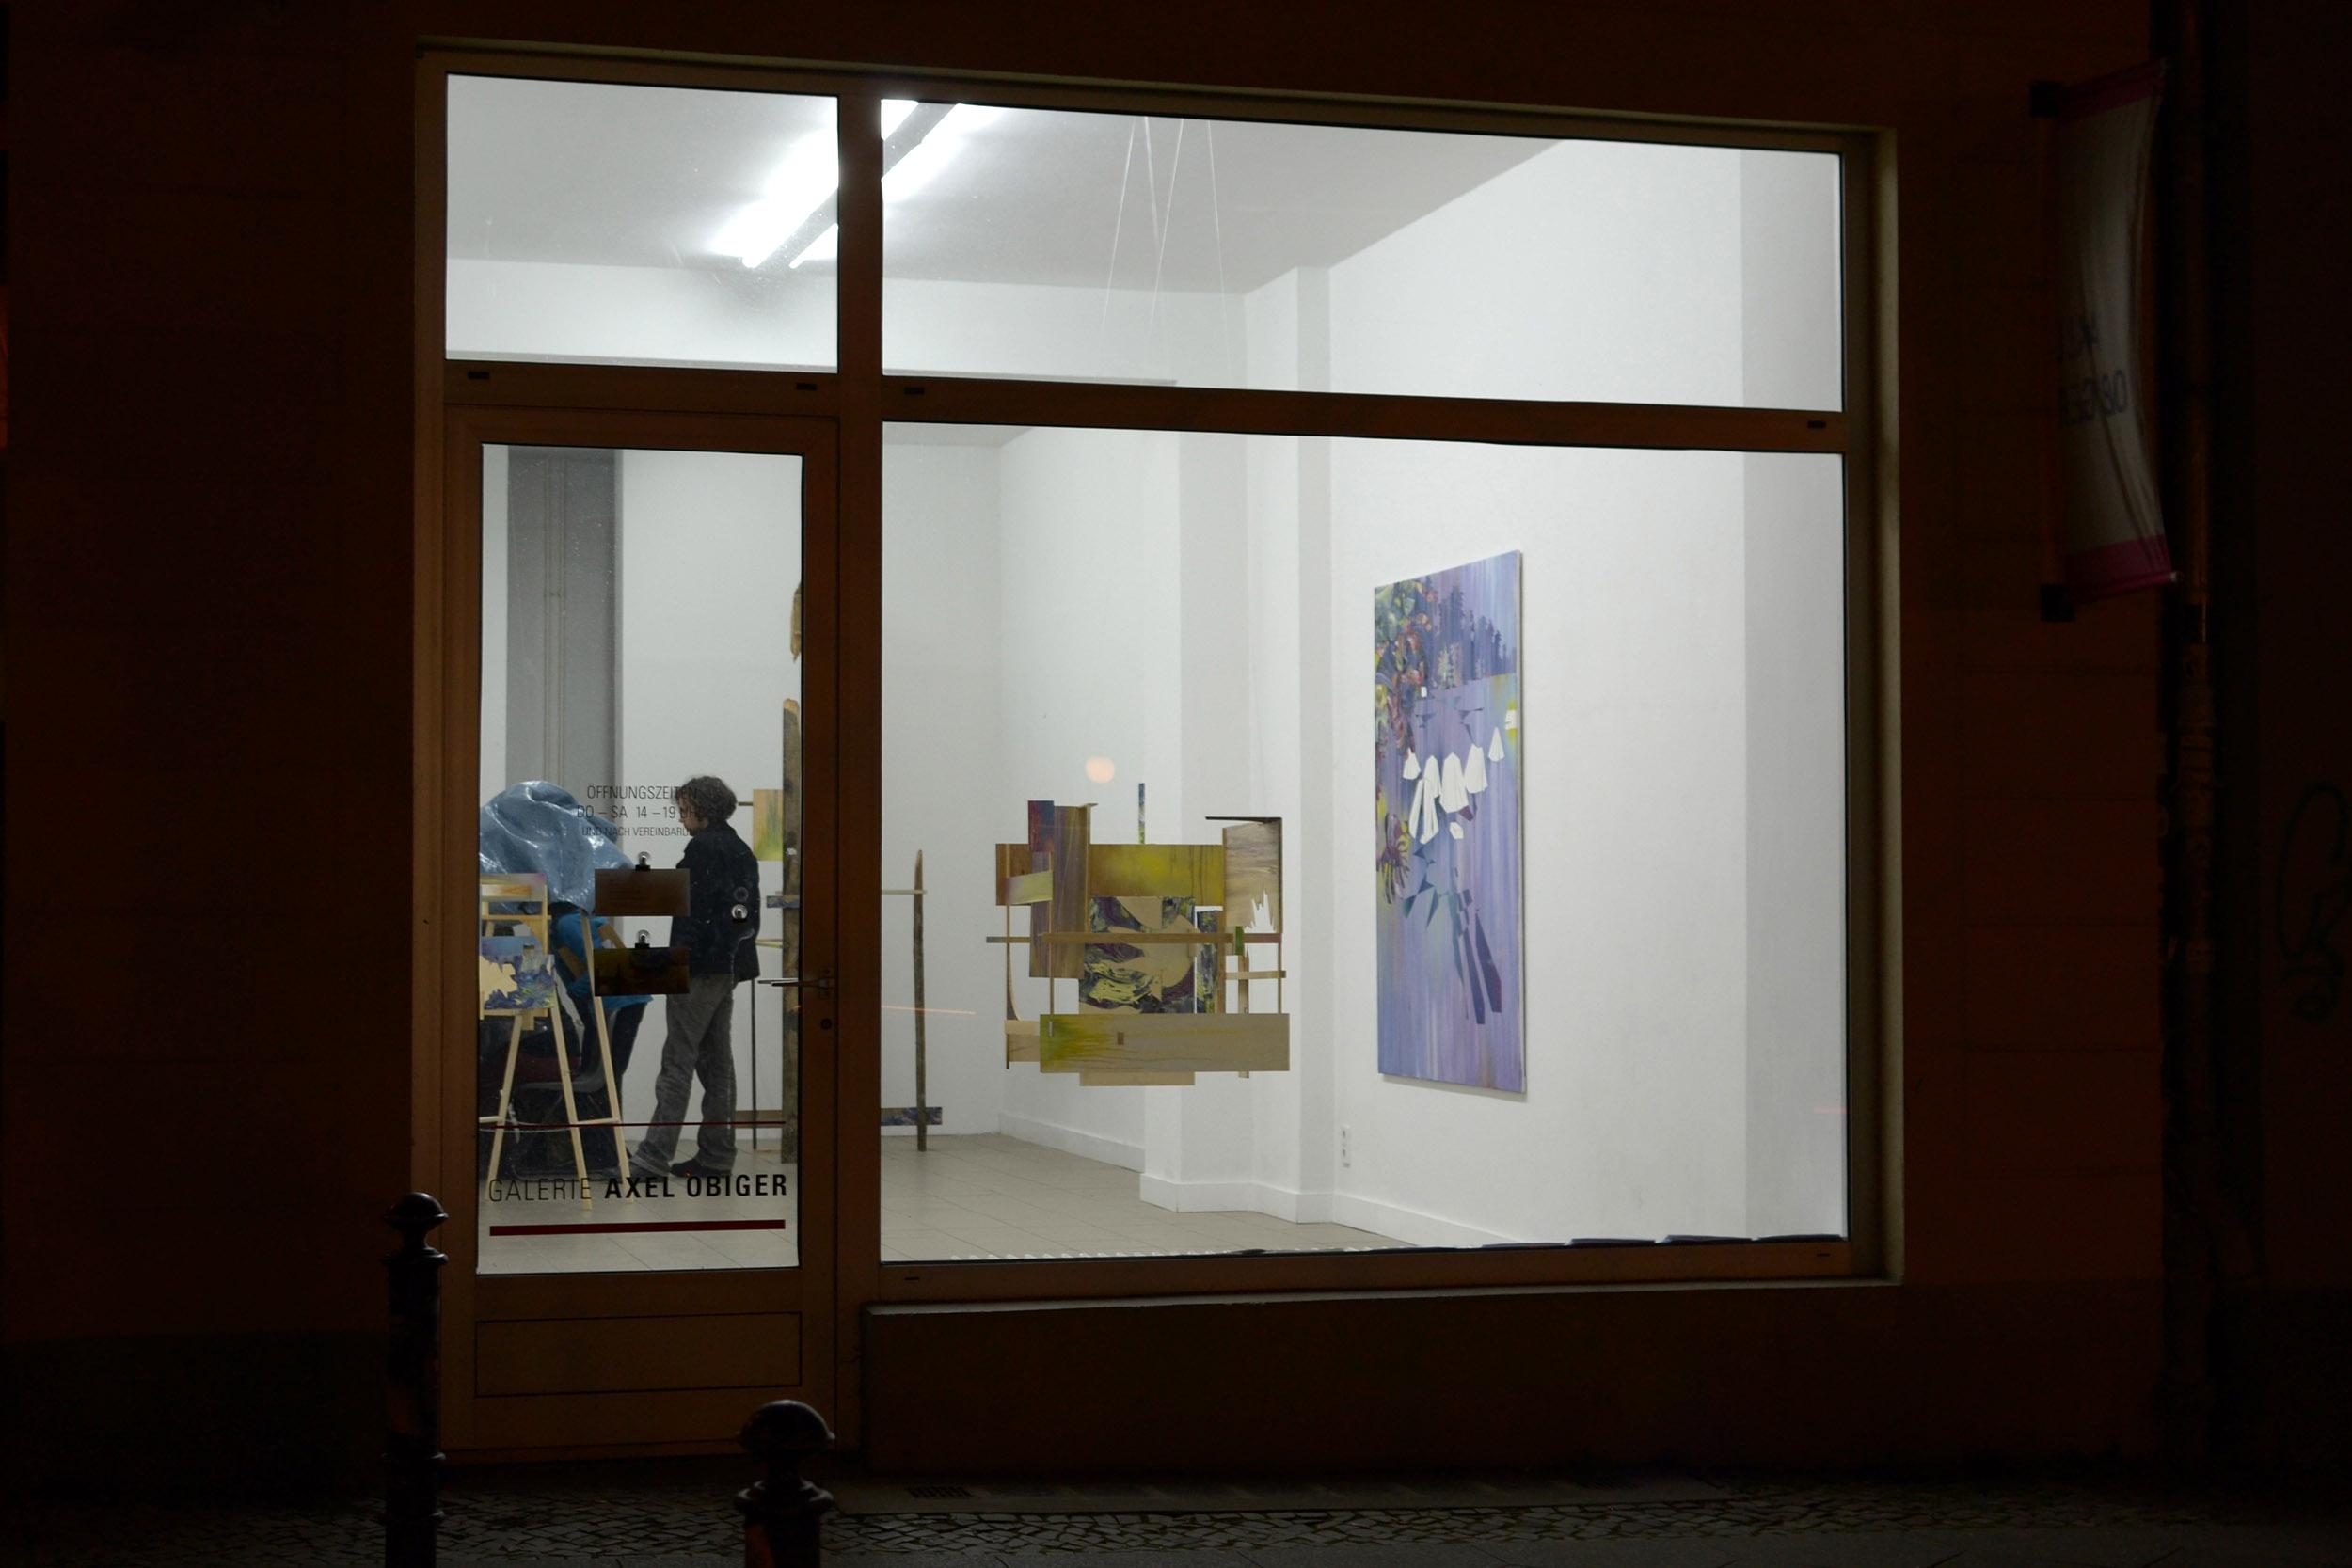 Mübafix  Galerie Axel Obiger Berlin, 2013